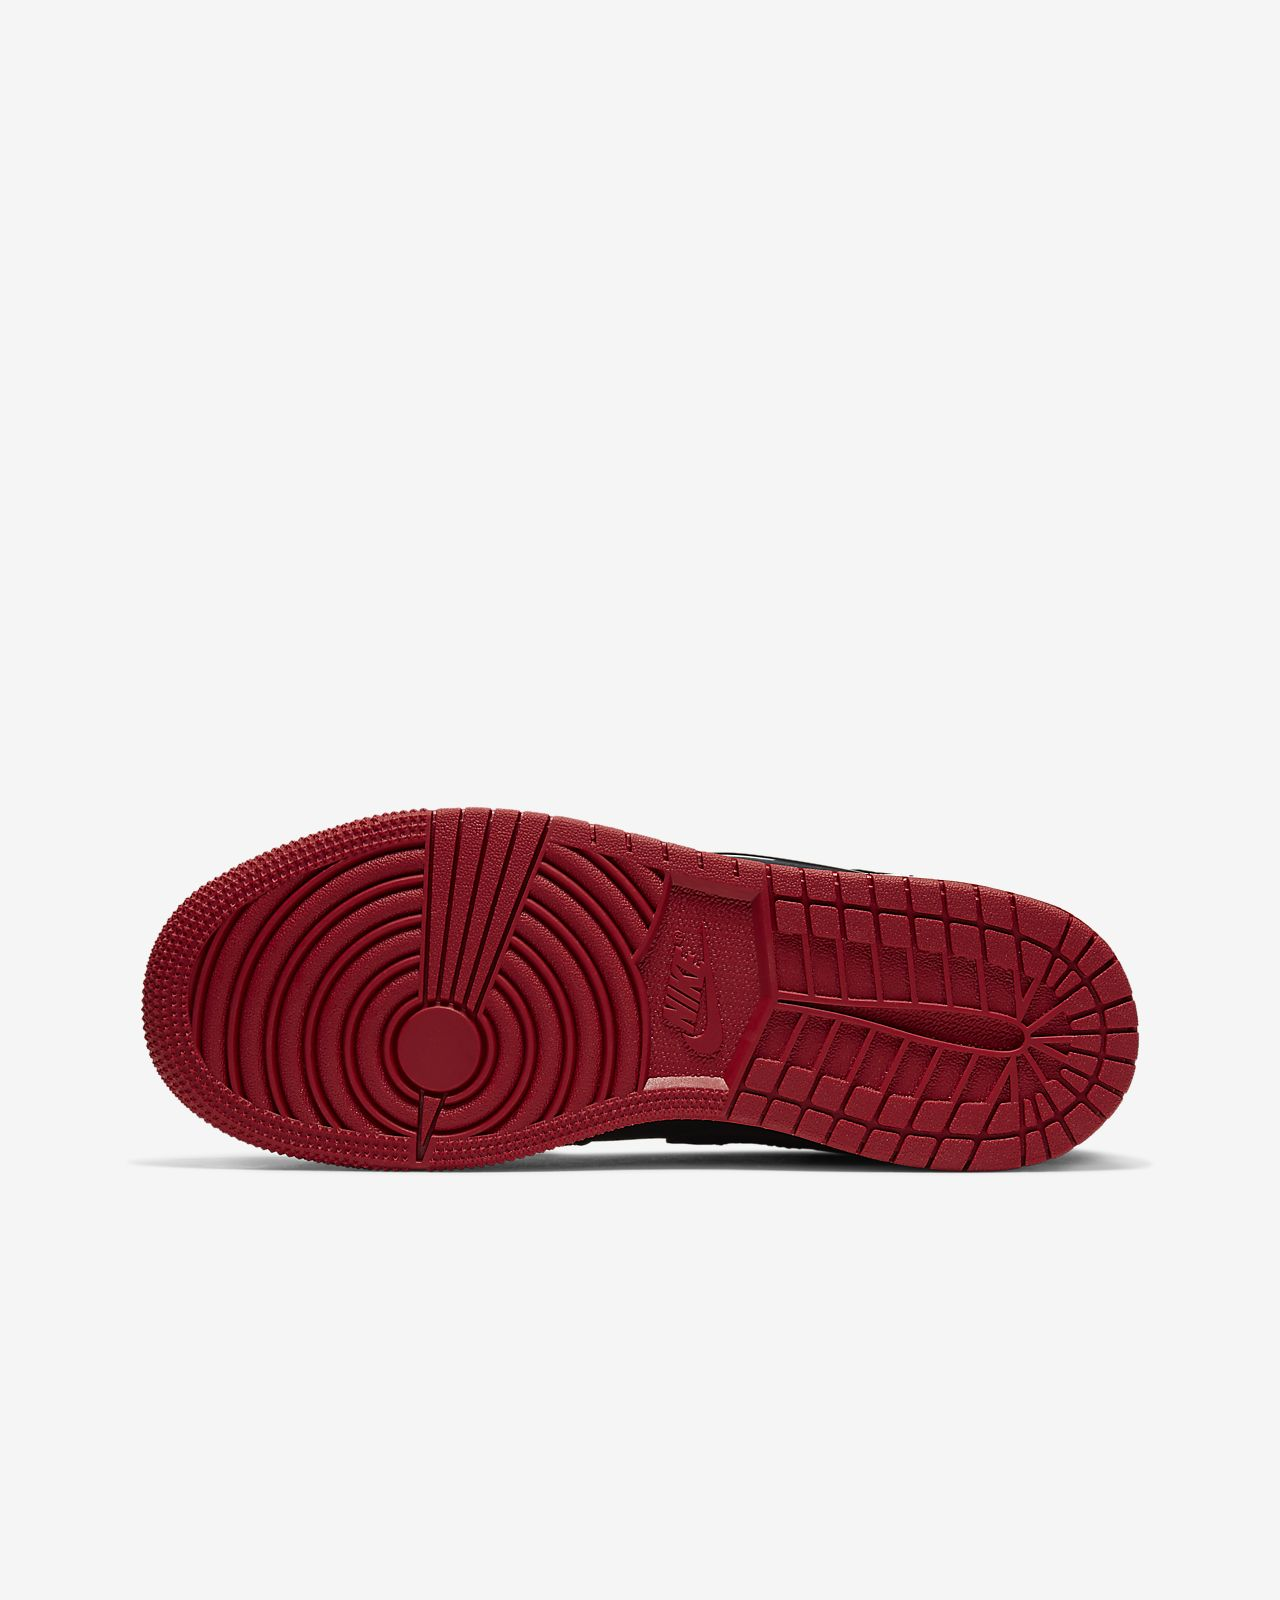 Air Jordan 1 Mid Fearless Big Kids' Shoe